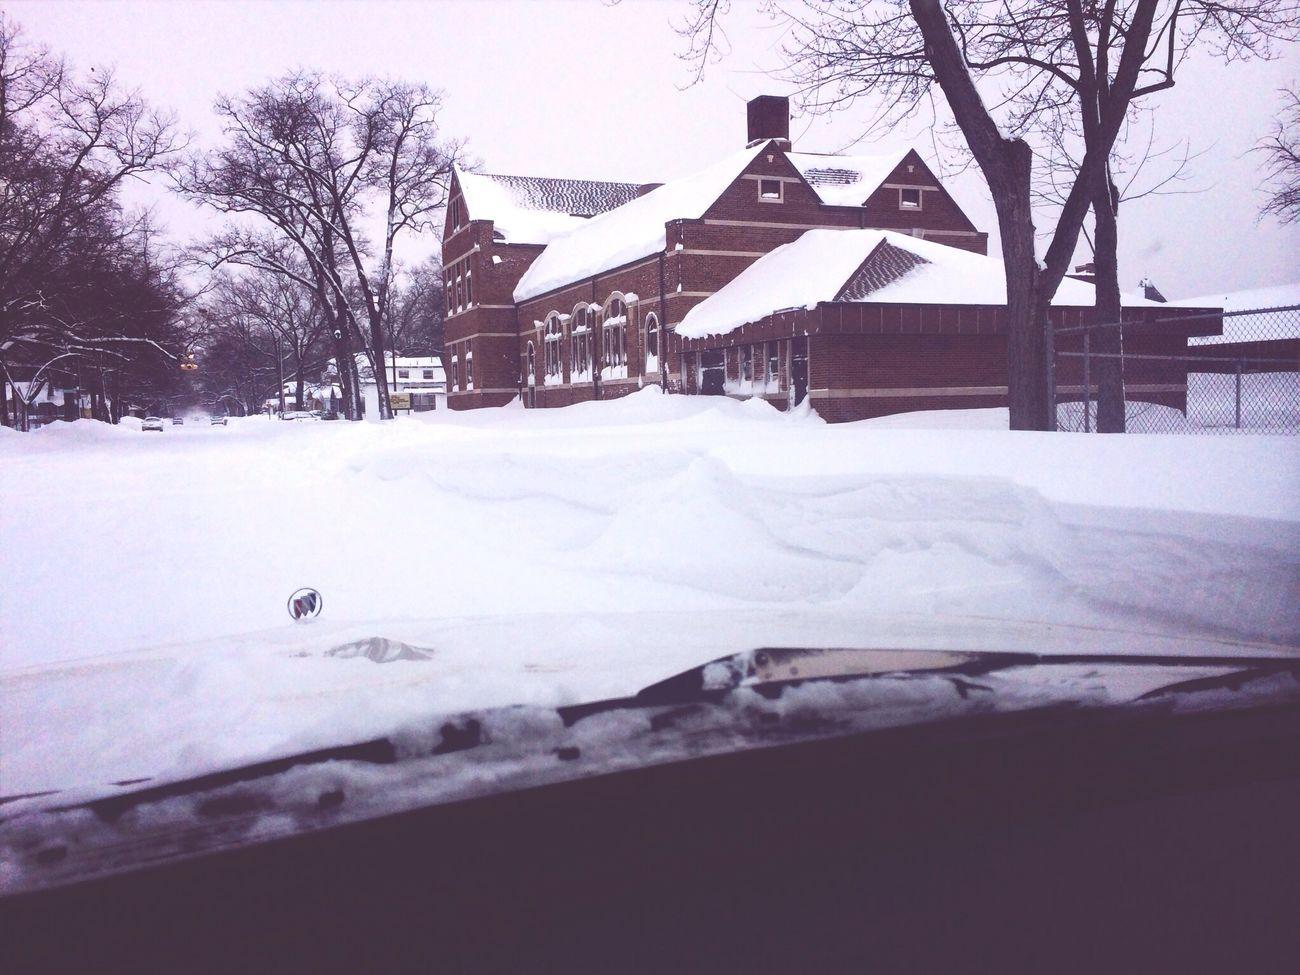 Just SnowSnowpocalypse